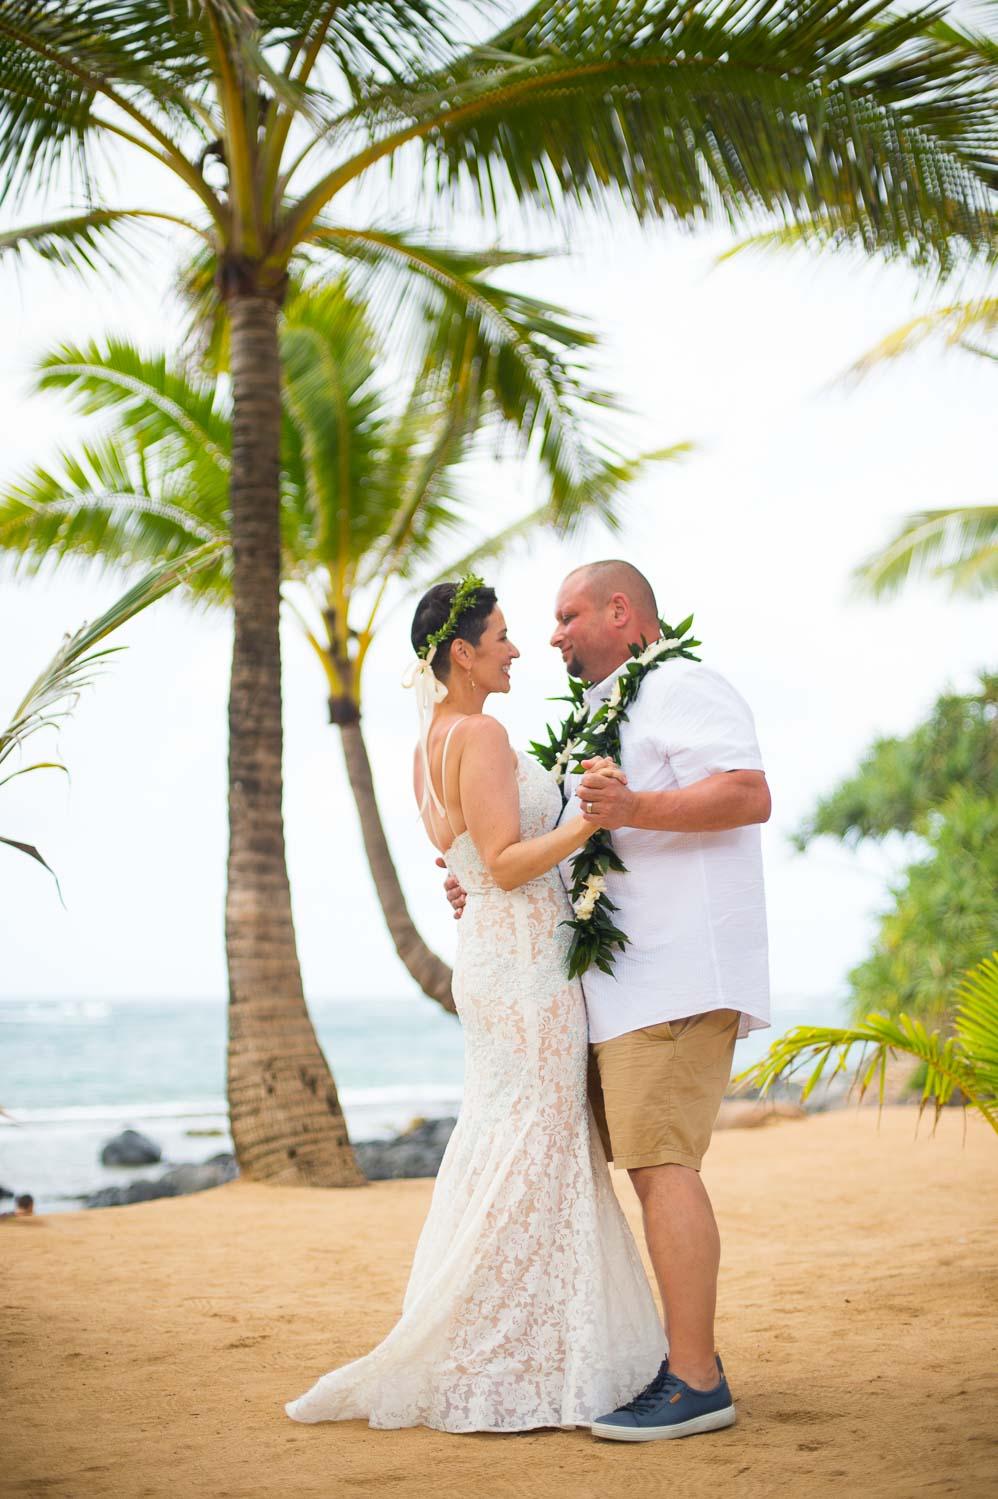 maui-wedding-photography-maui-wedding-venue-Tad-Craig-Photography-33.jpg